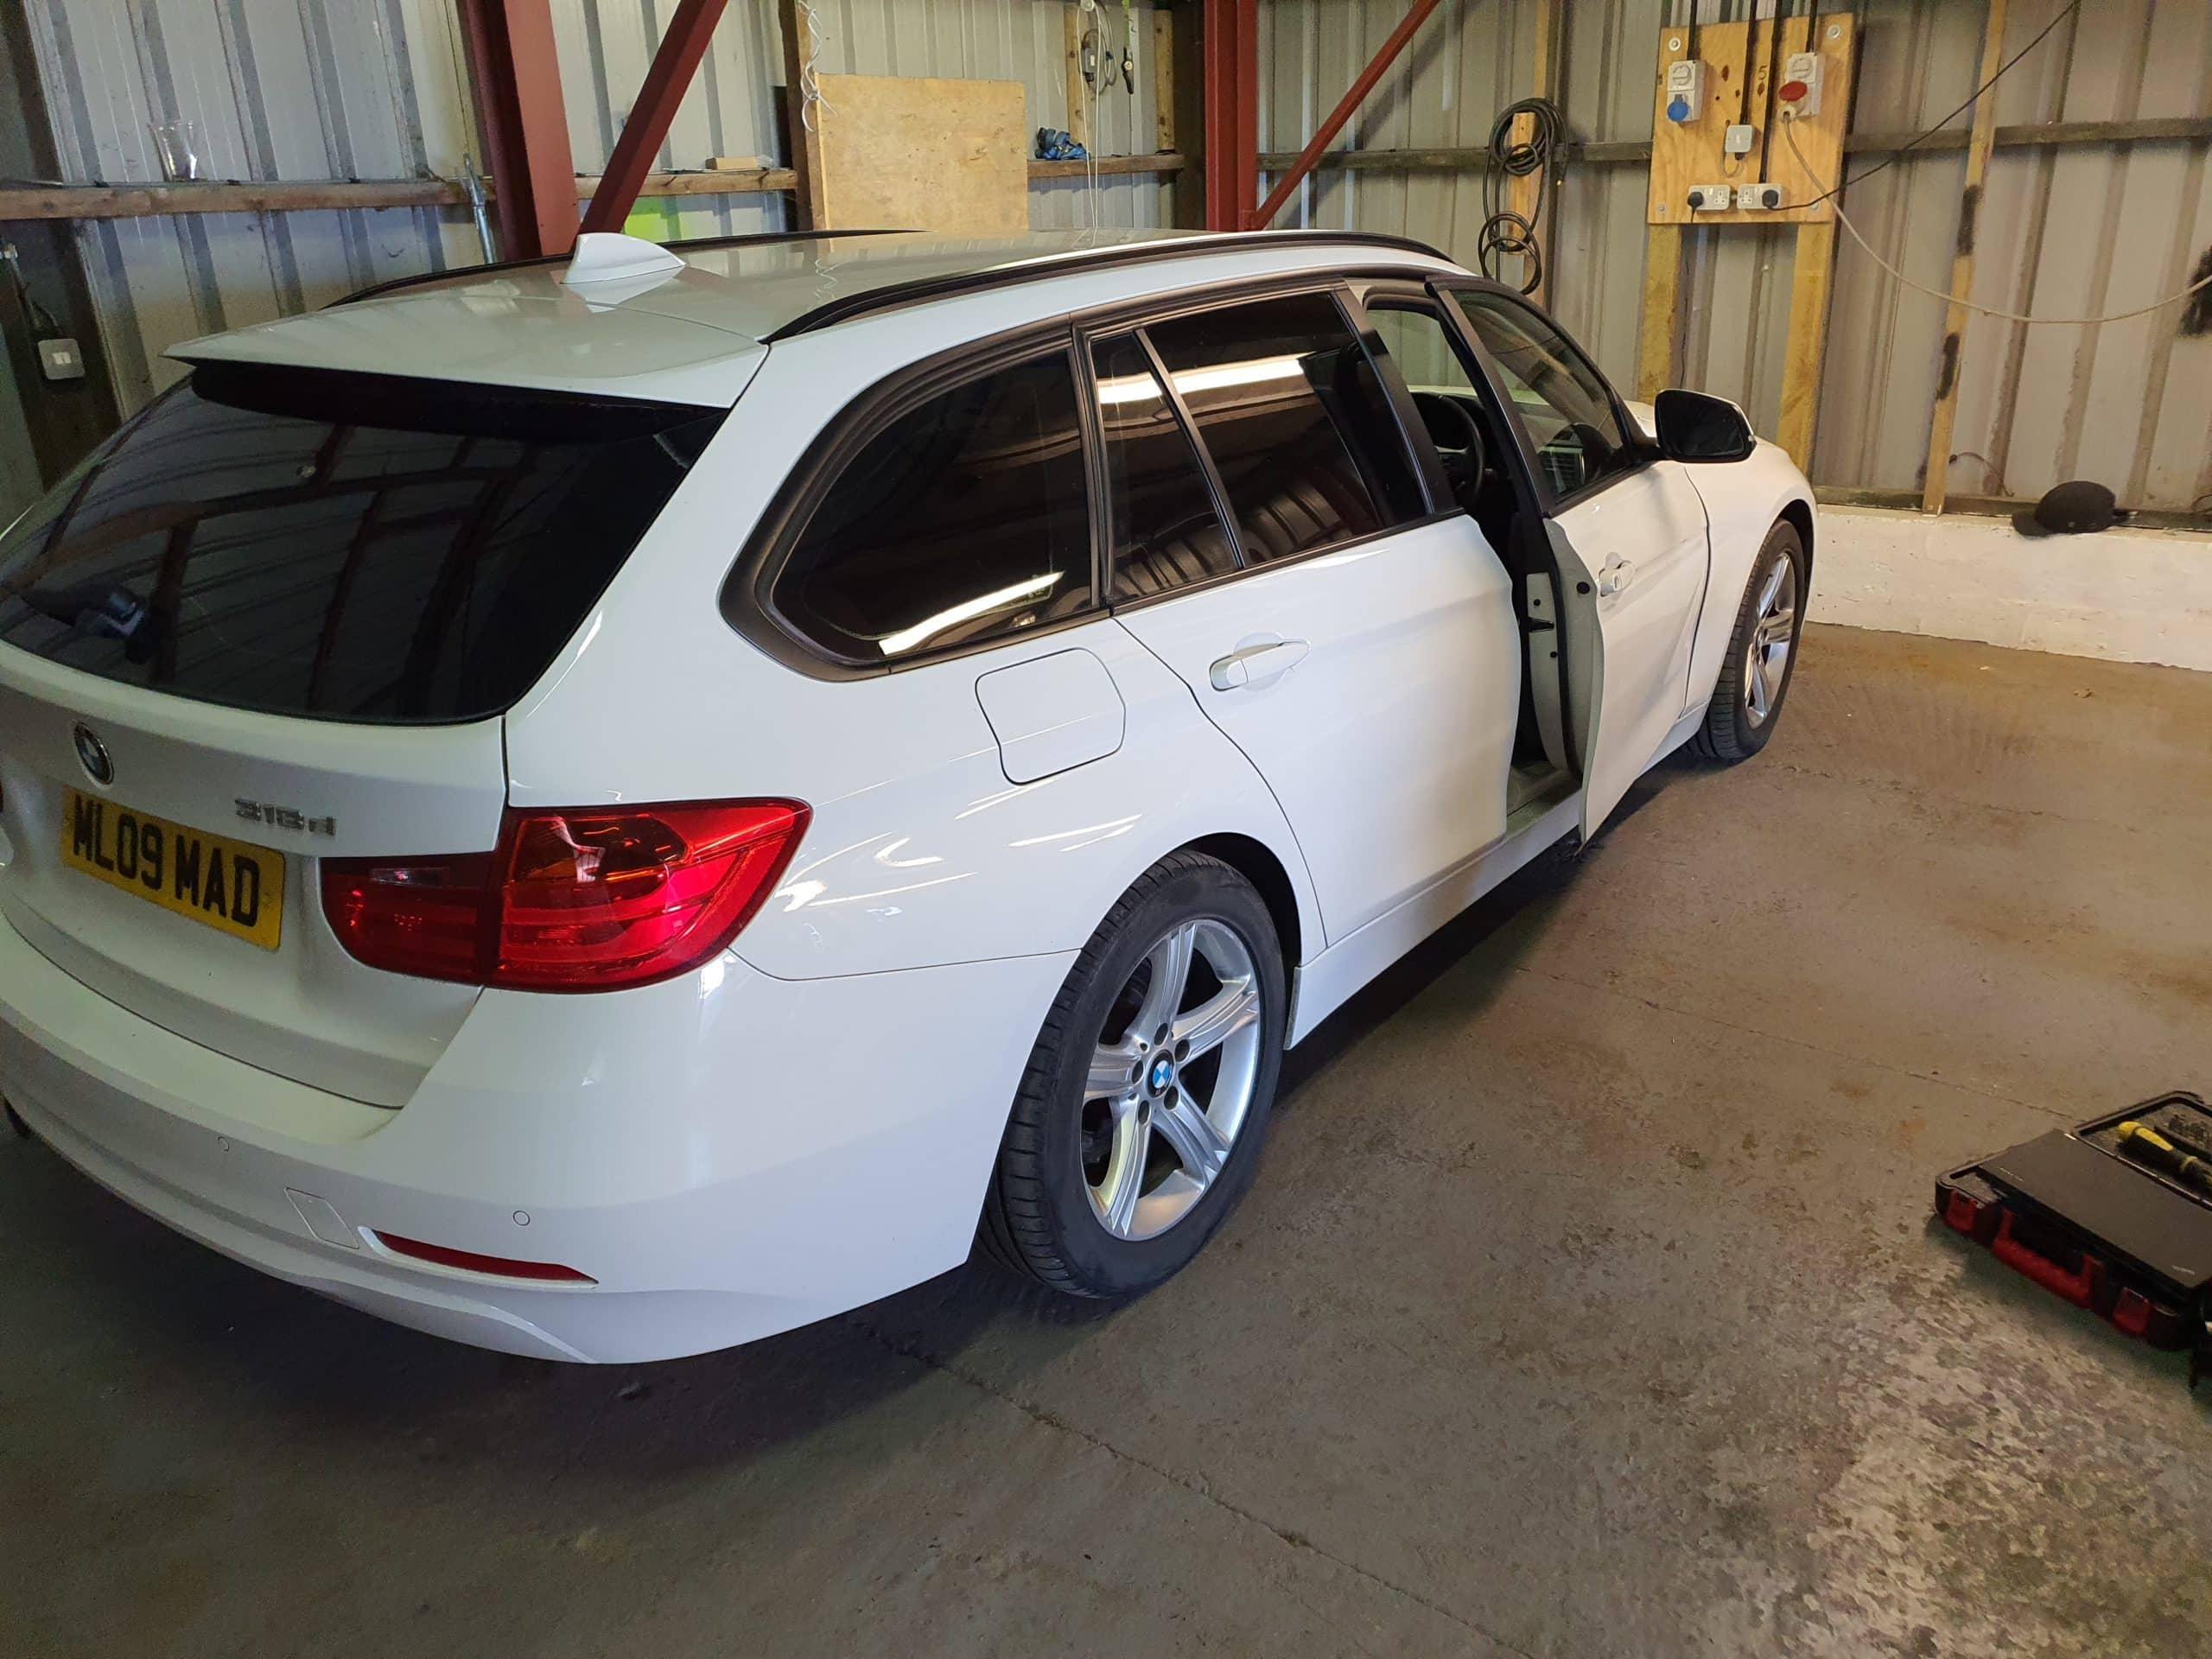 BMW Specialist Diagnostics